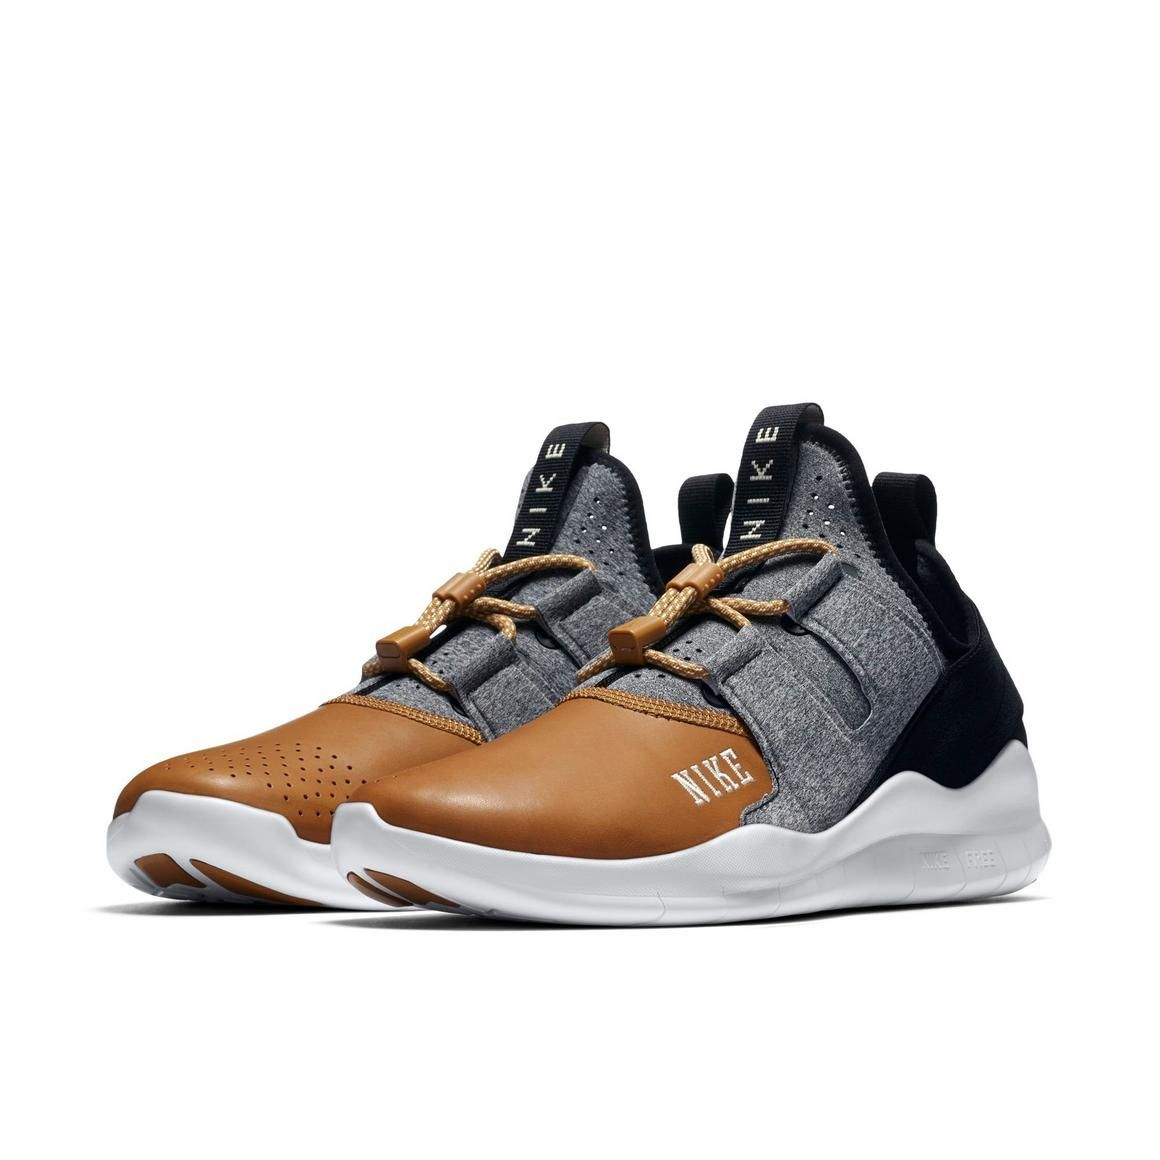 "Nike Free RN Commuter 2018 ""Muted Bronze"" Men's Running"